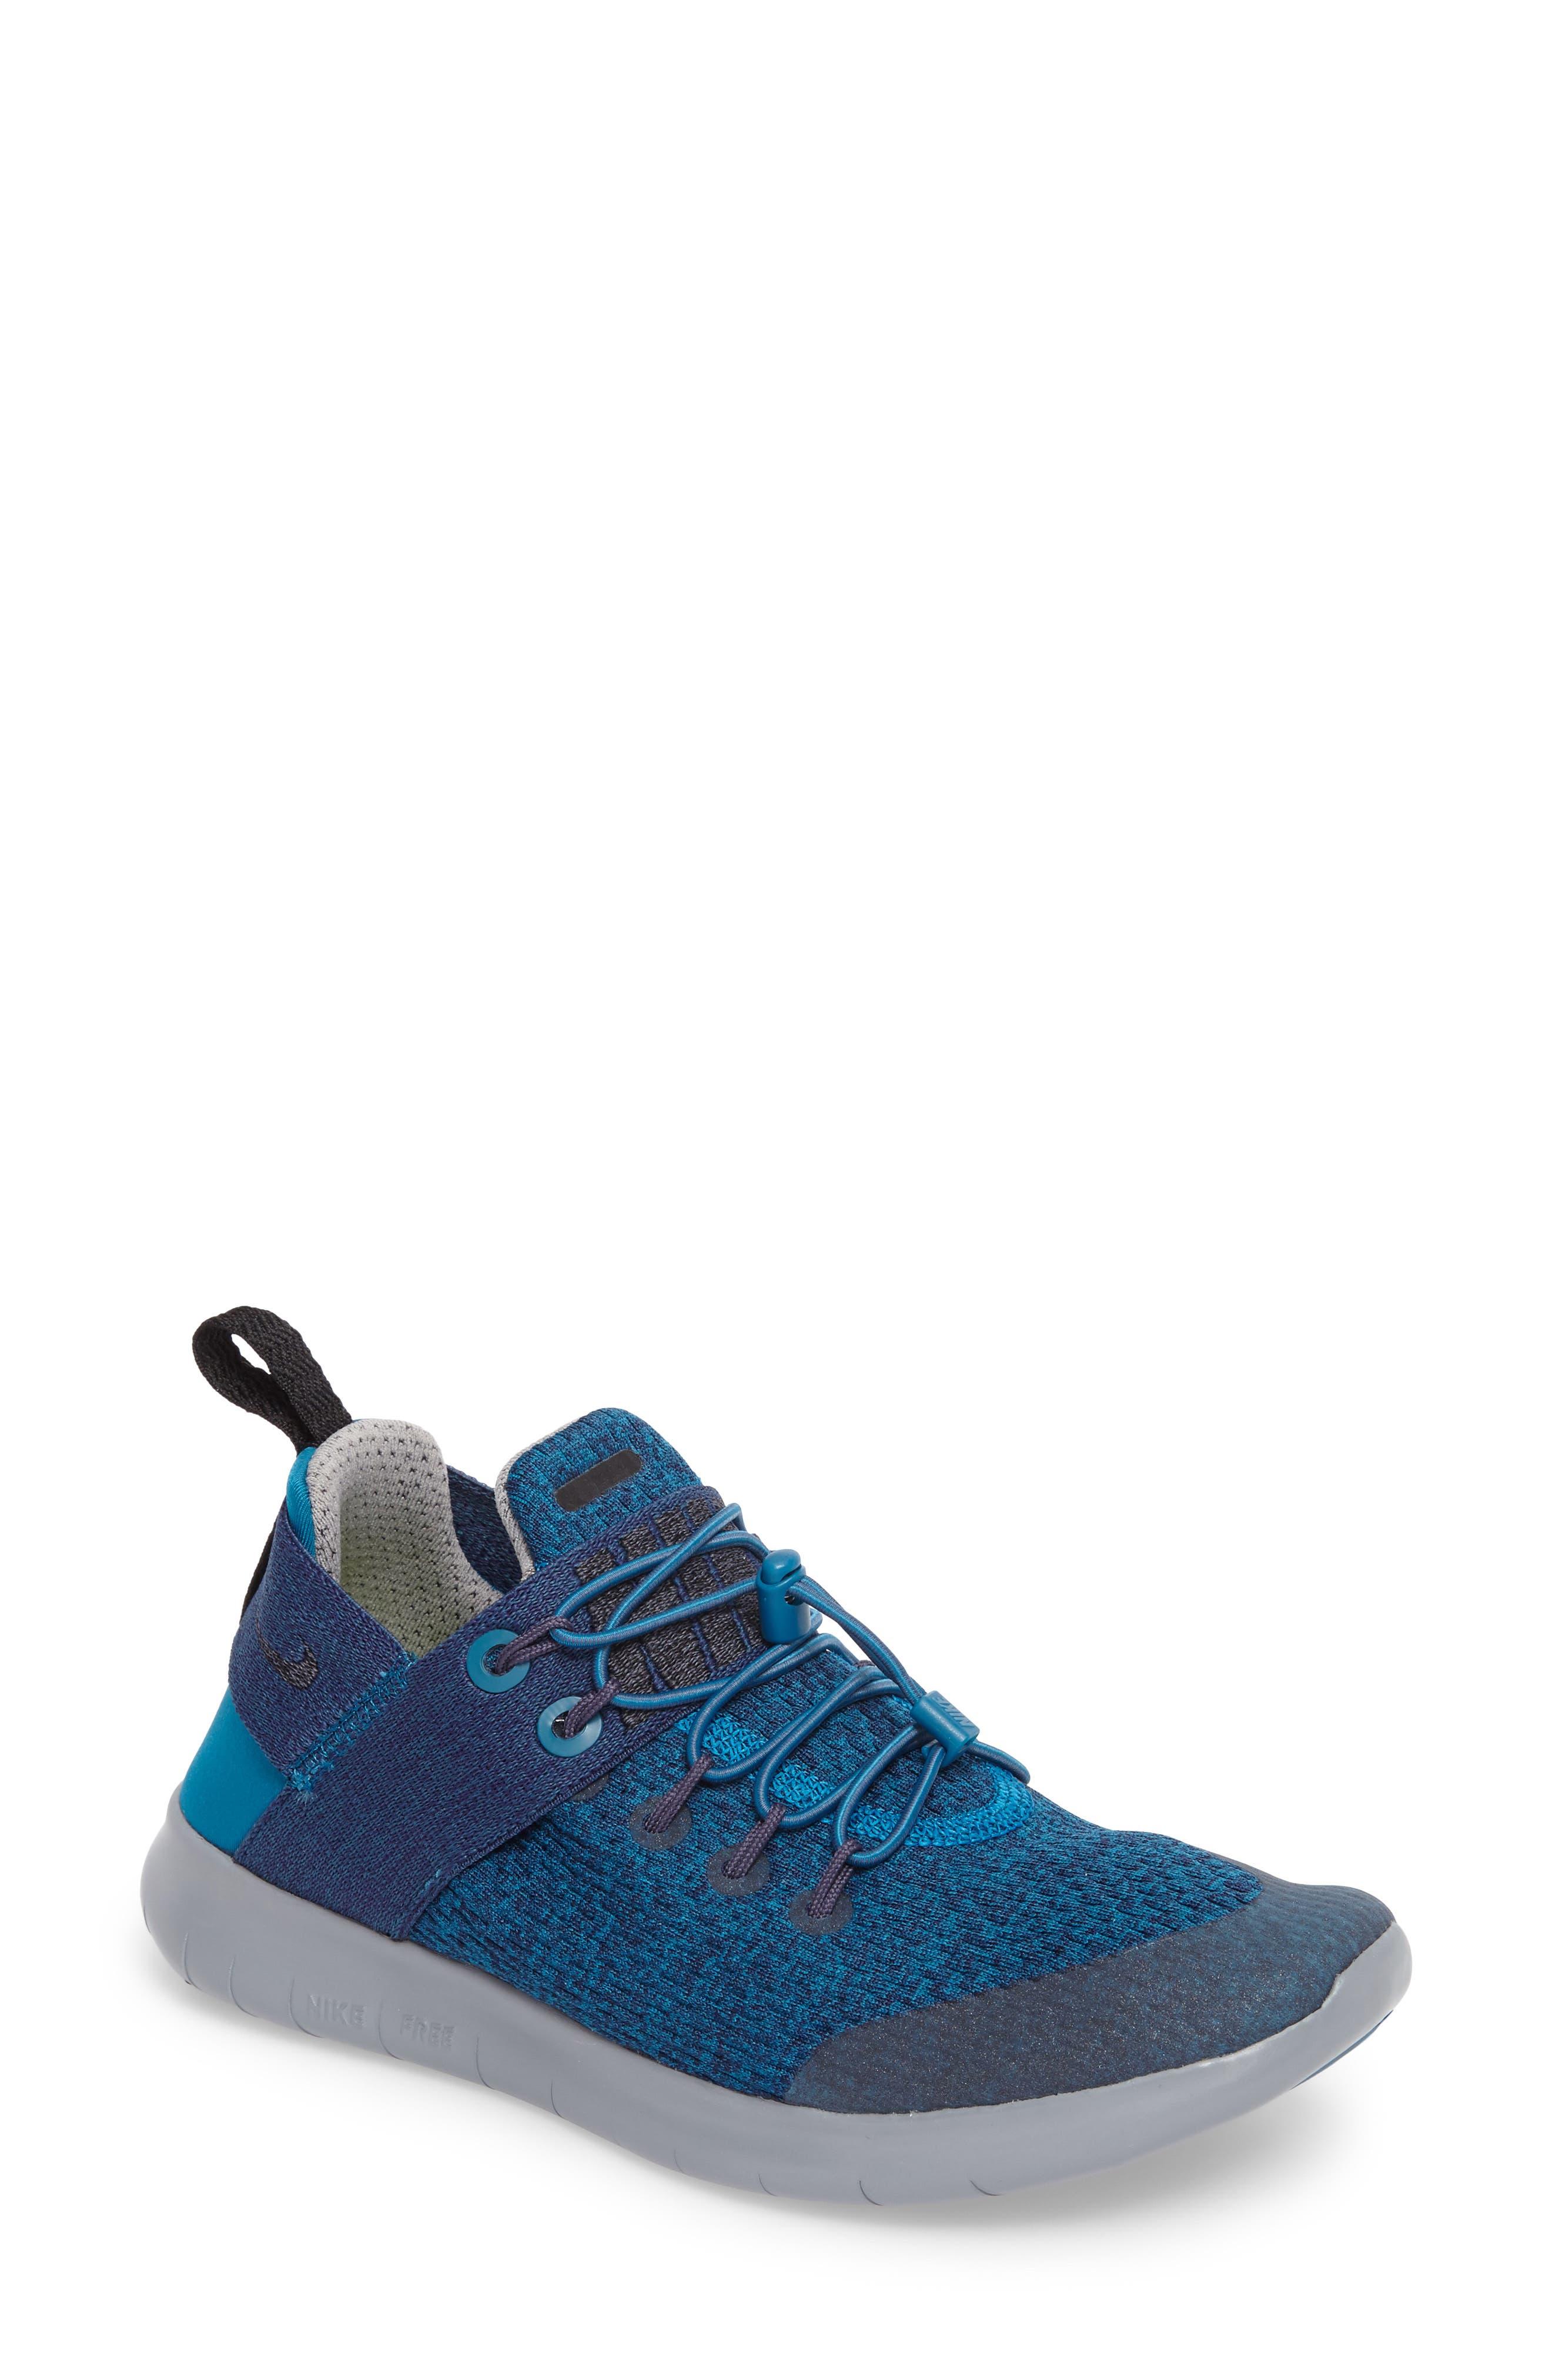 Free RN Commuter 2017 Premium Running Shoe,                             Main thumbnail 1, color,                             Green / Black/ Cobblestone